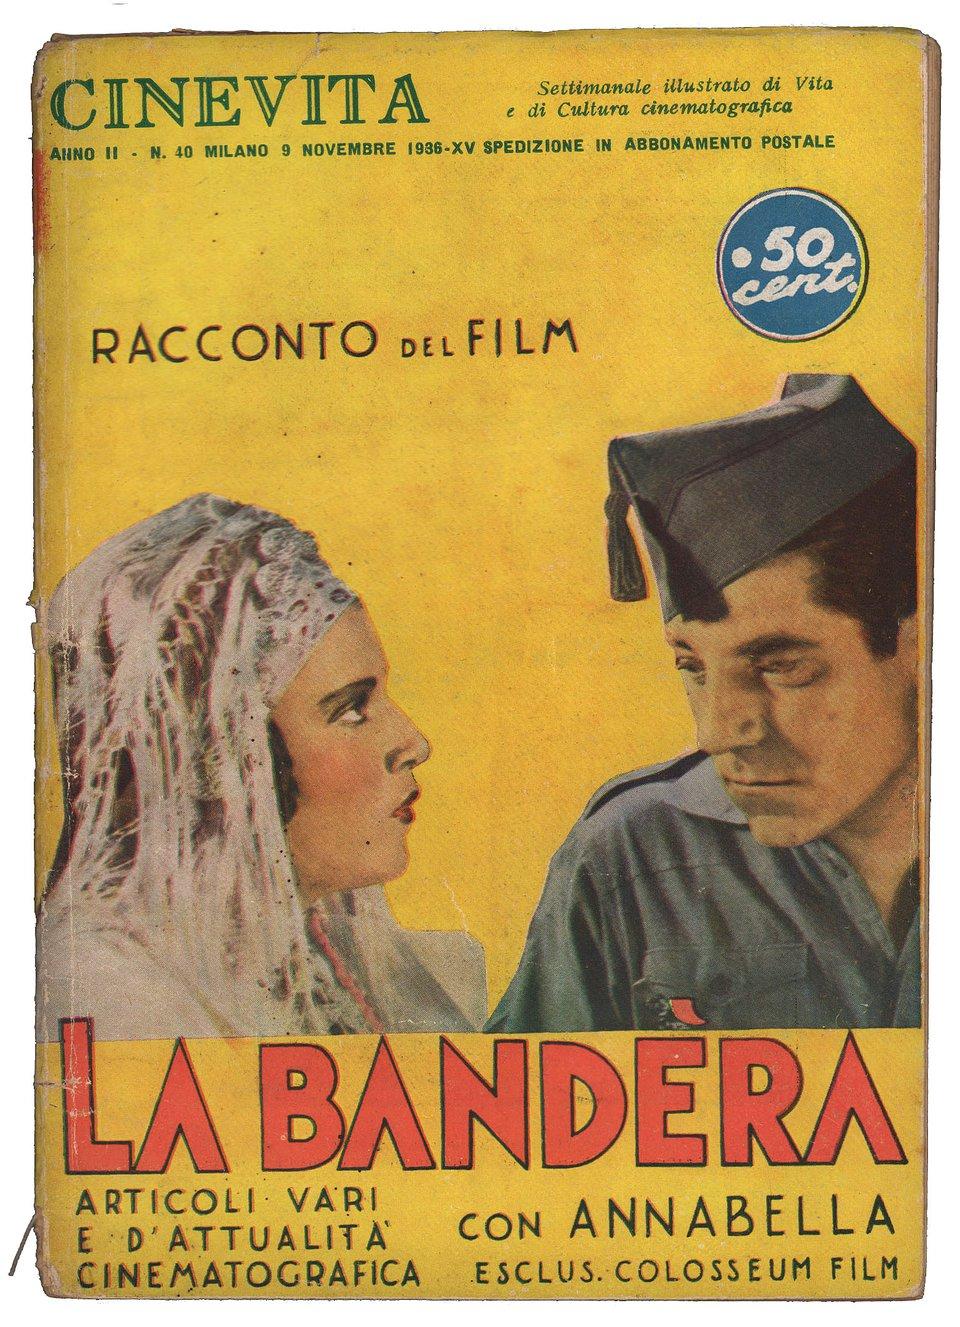 La bandera 1935 Italian Magazine